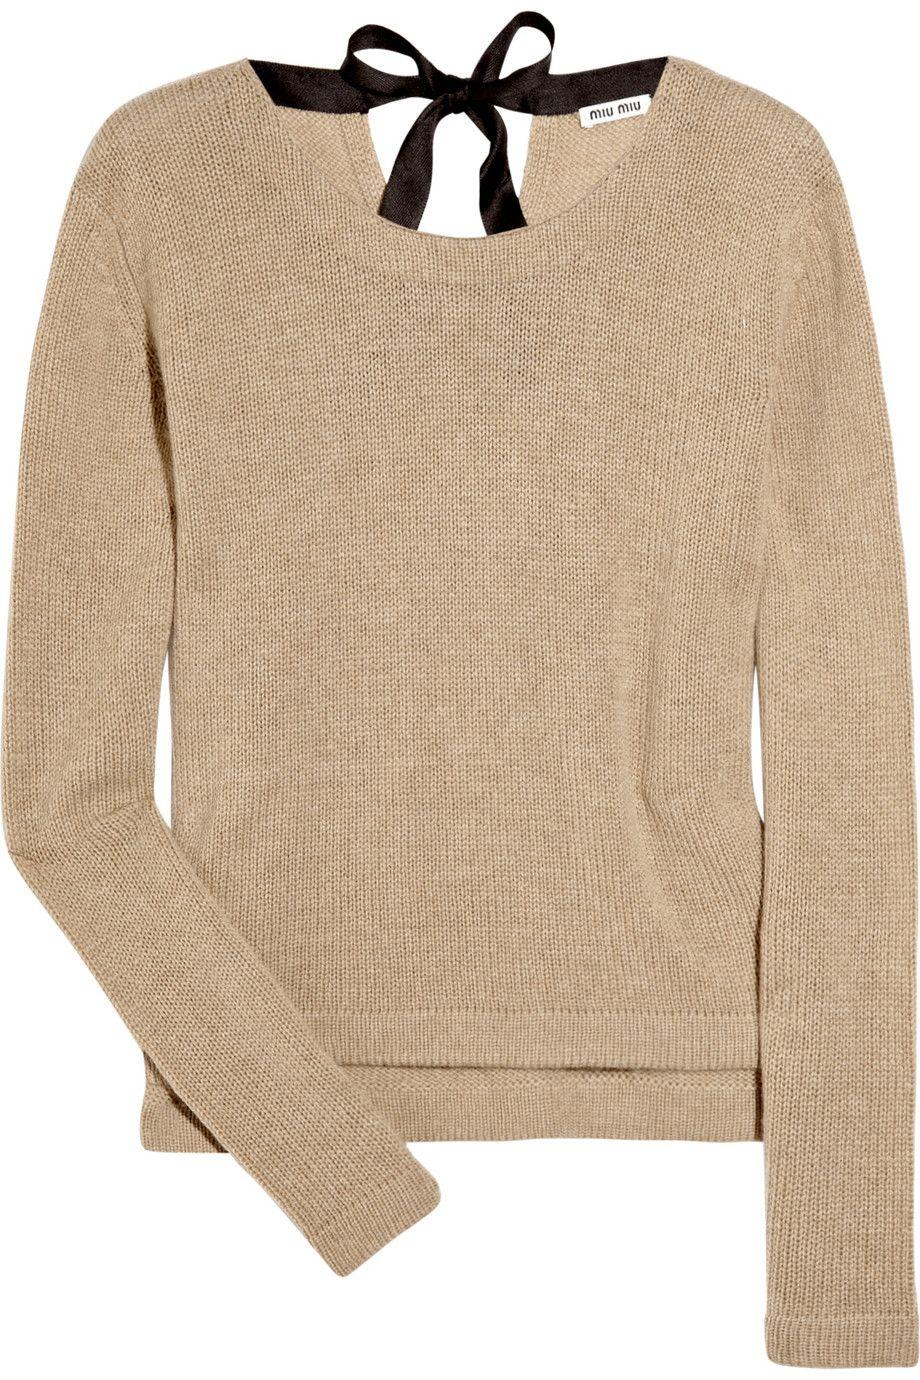 Miu Miu bow-back cashmere knitted sweater